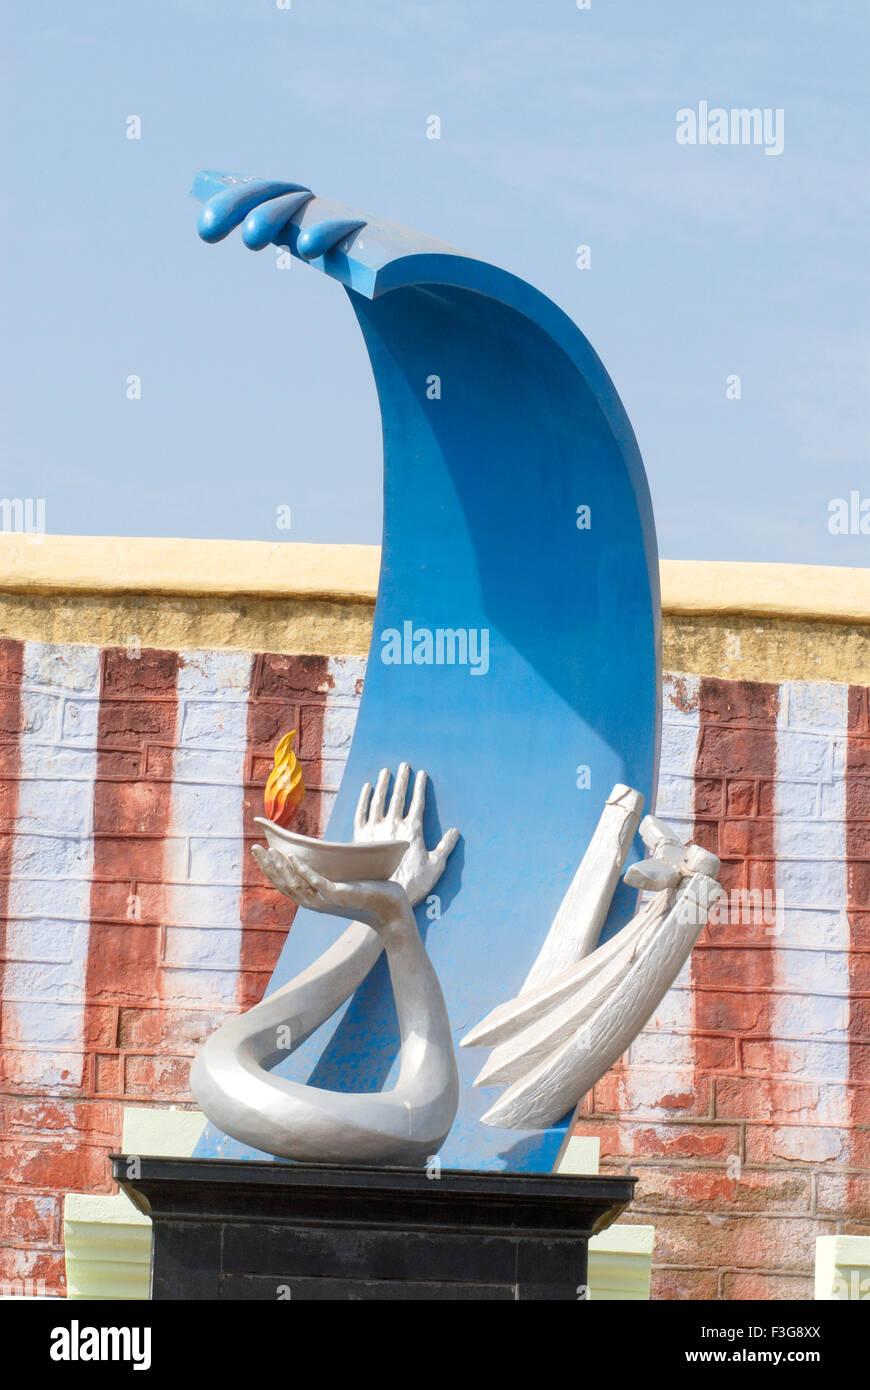 Memorial for those who lost their lives in Tsunami on 26/12/2004 ; Kanyakumari ; Tamil Nadu ; India - Stock Image